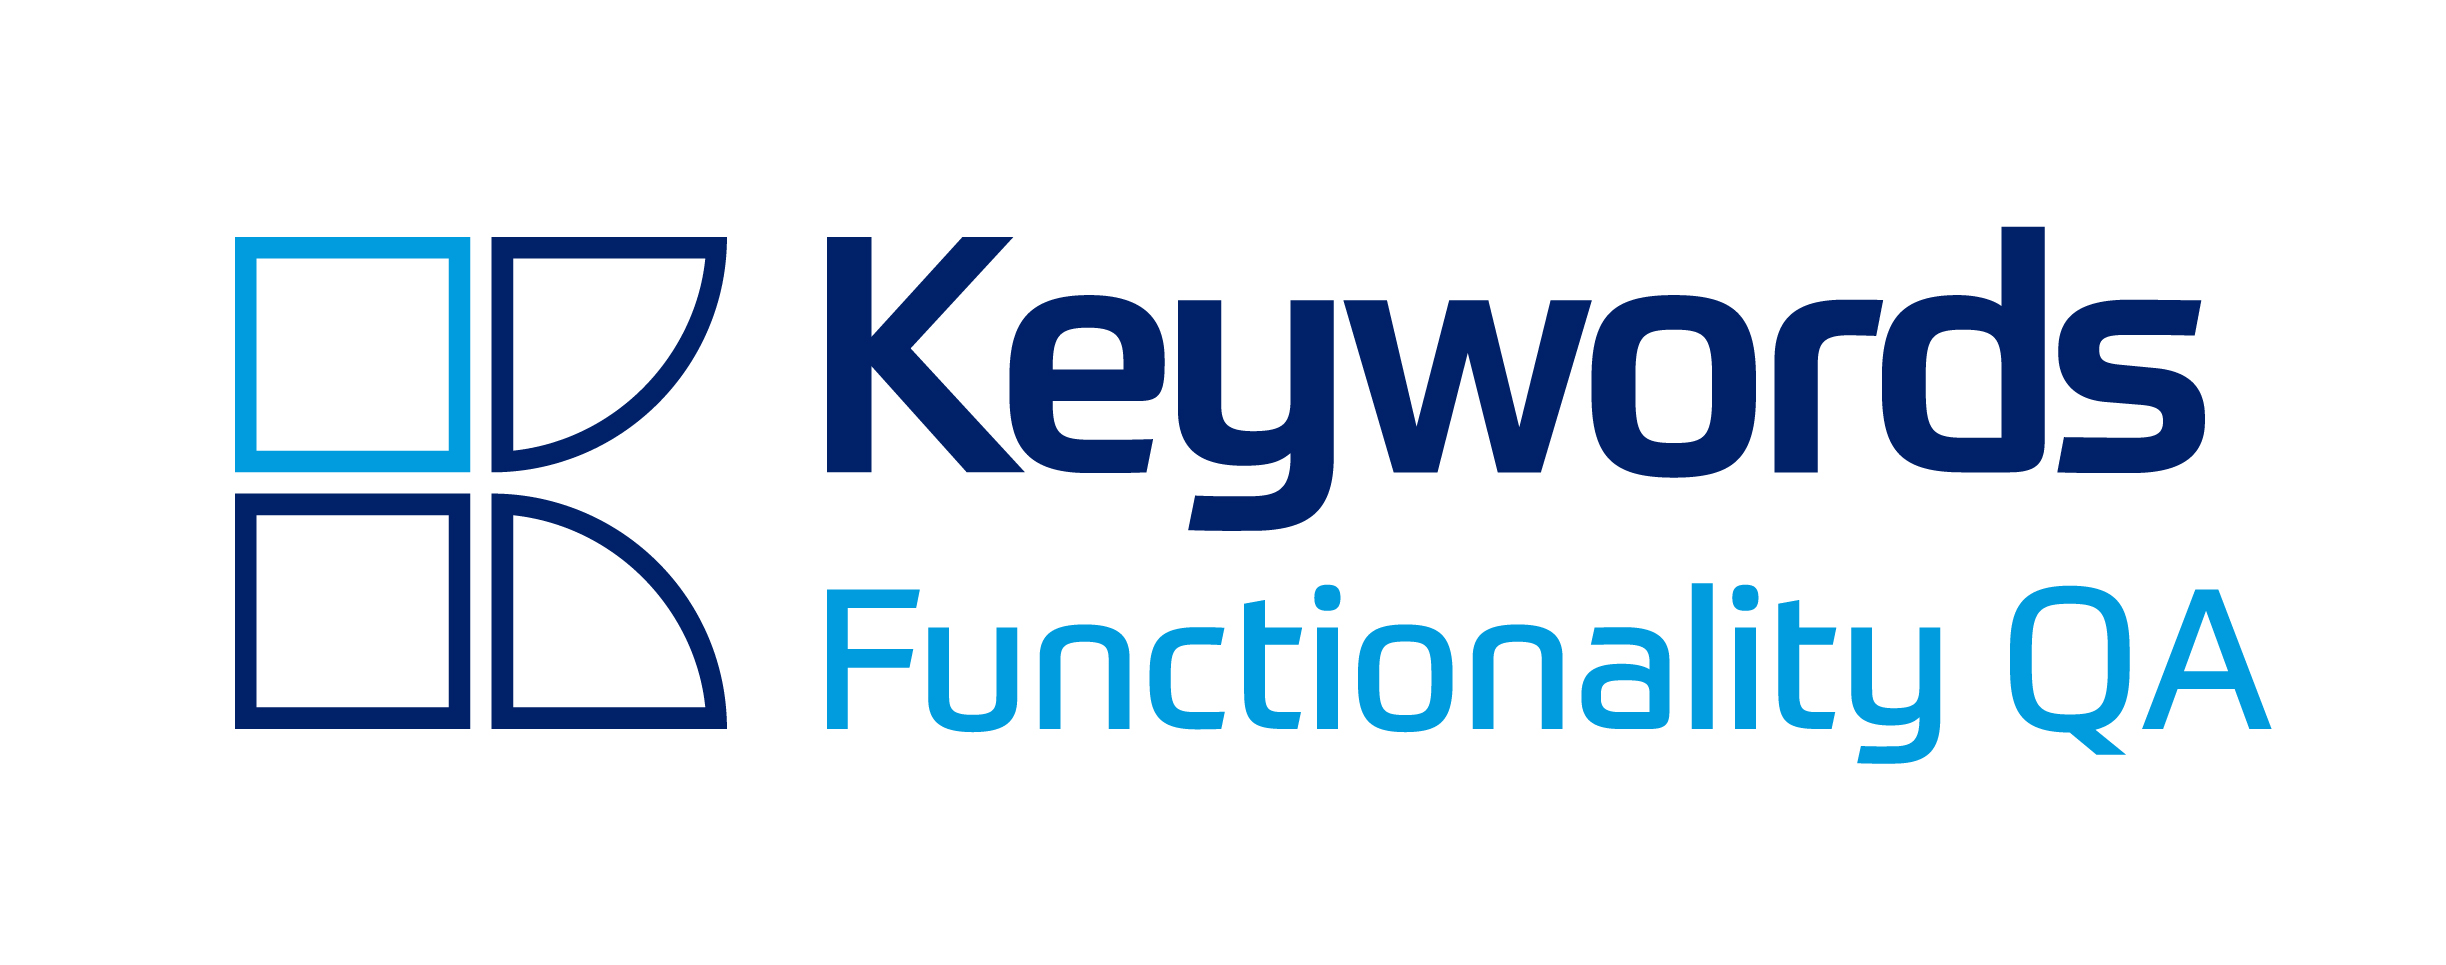 KW_Functionality QA_RGB@300ppi